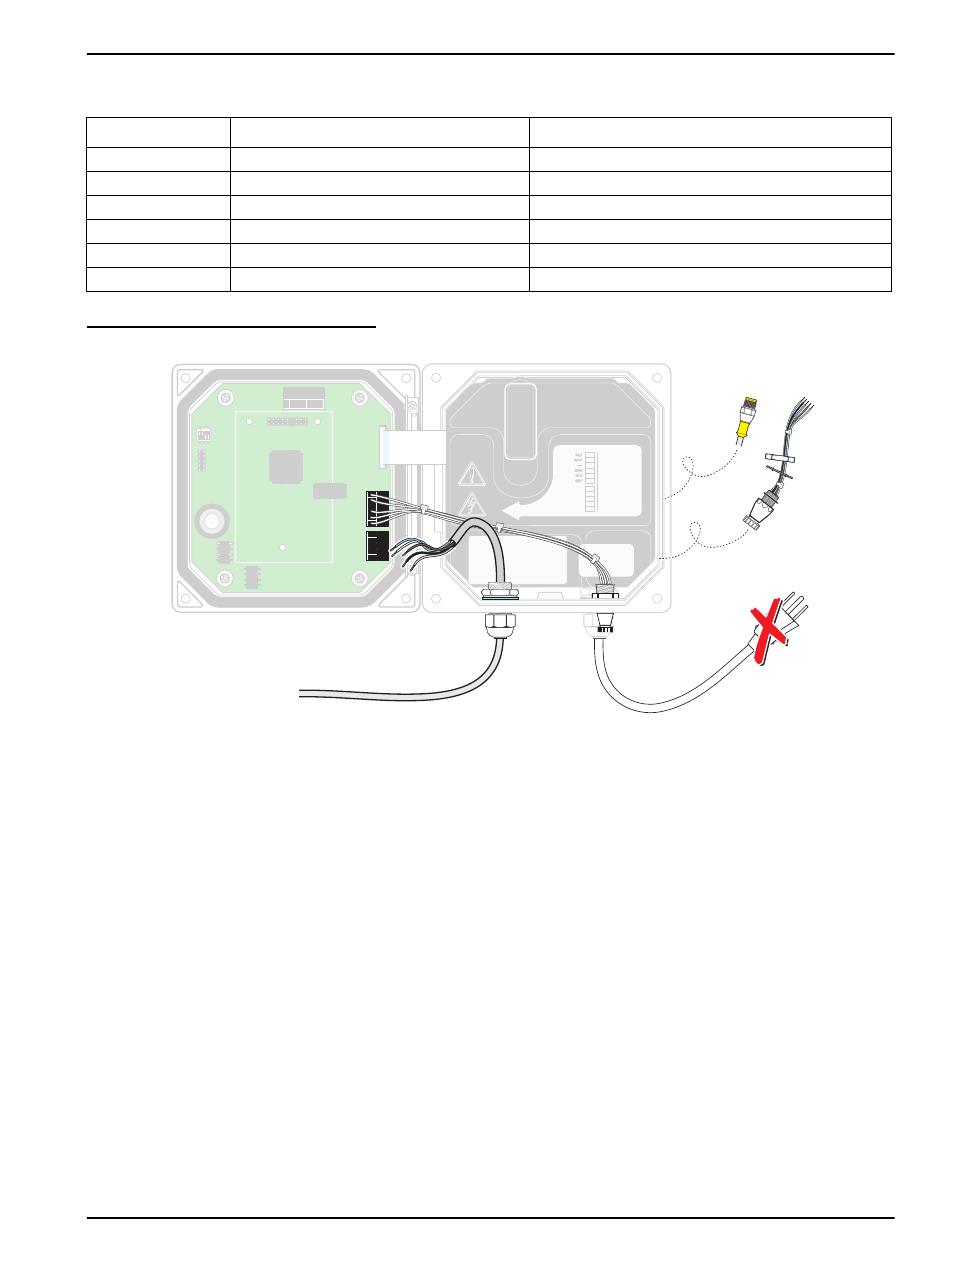 Table 4 wiring the sensor at terminal block j5, Figure 8